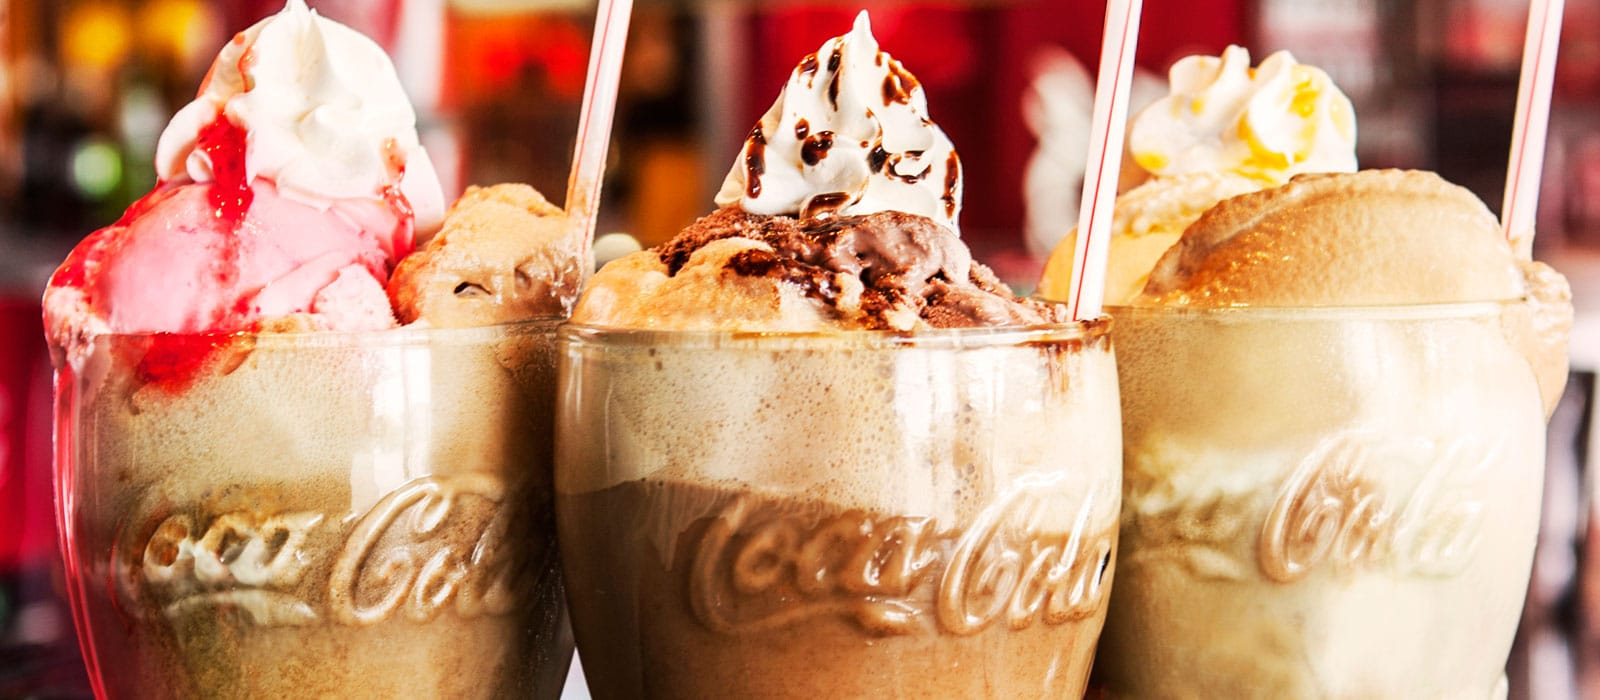 Rock A Cola Cafe